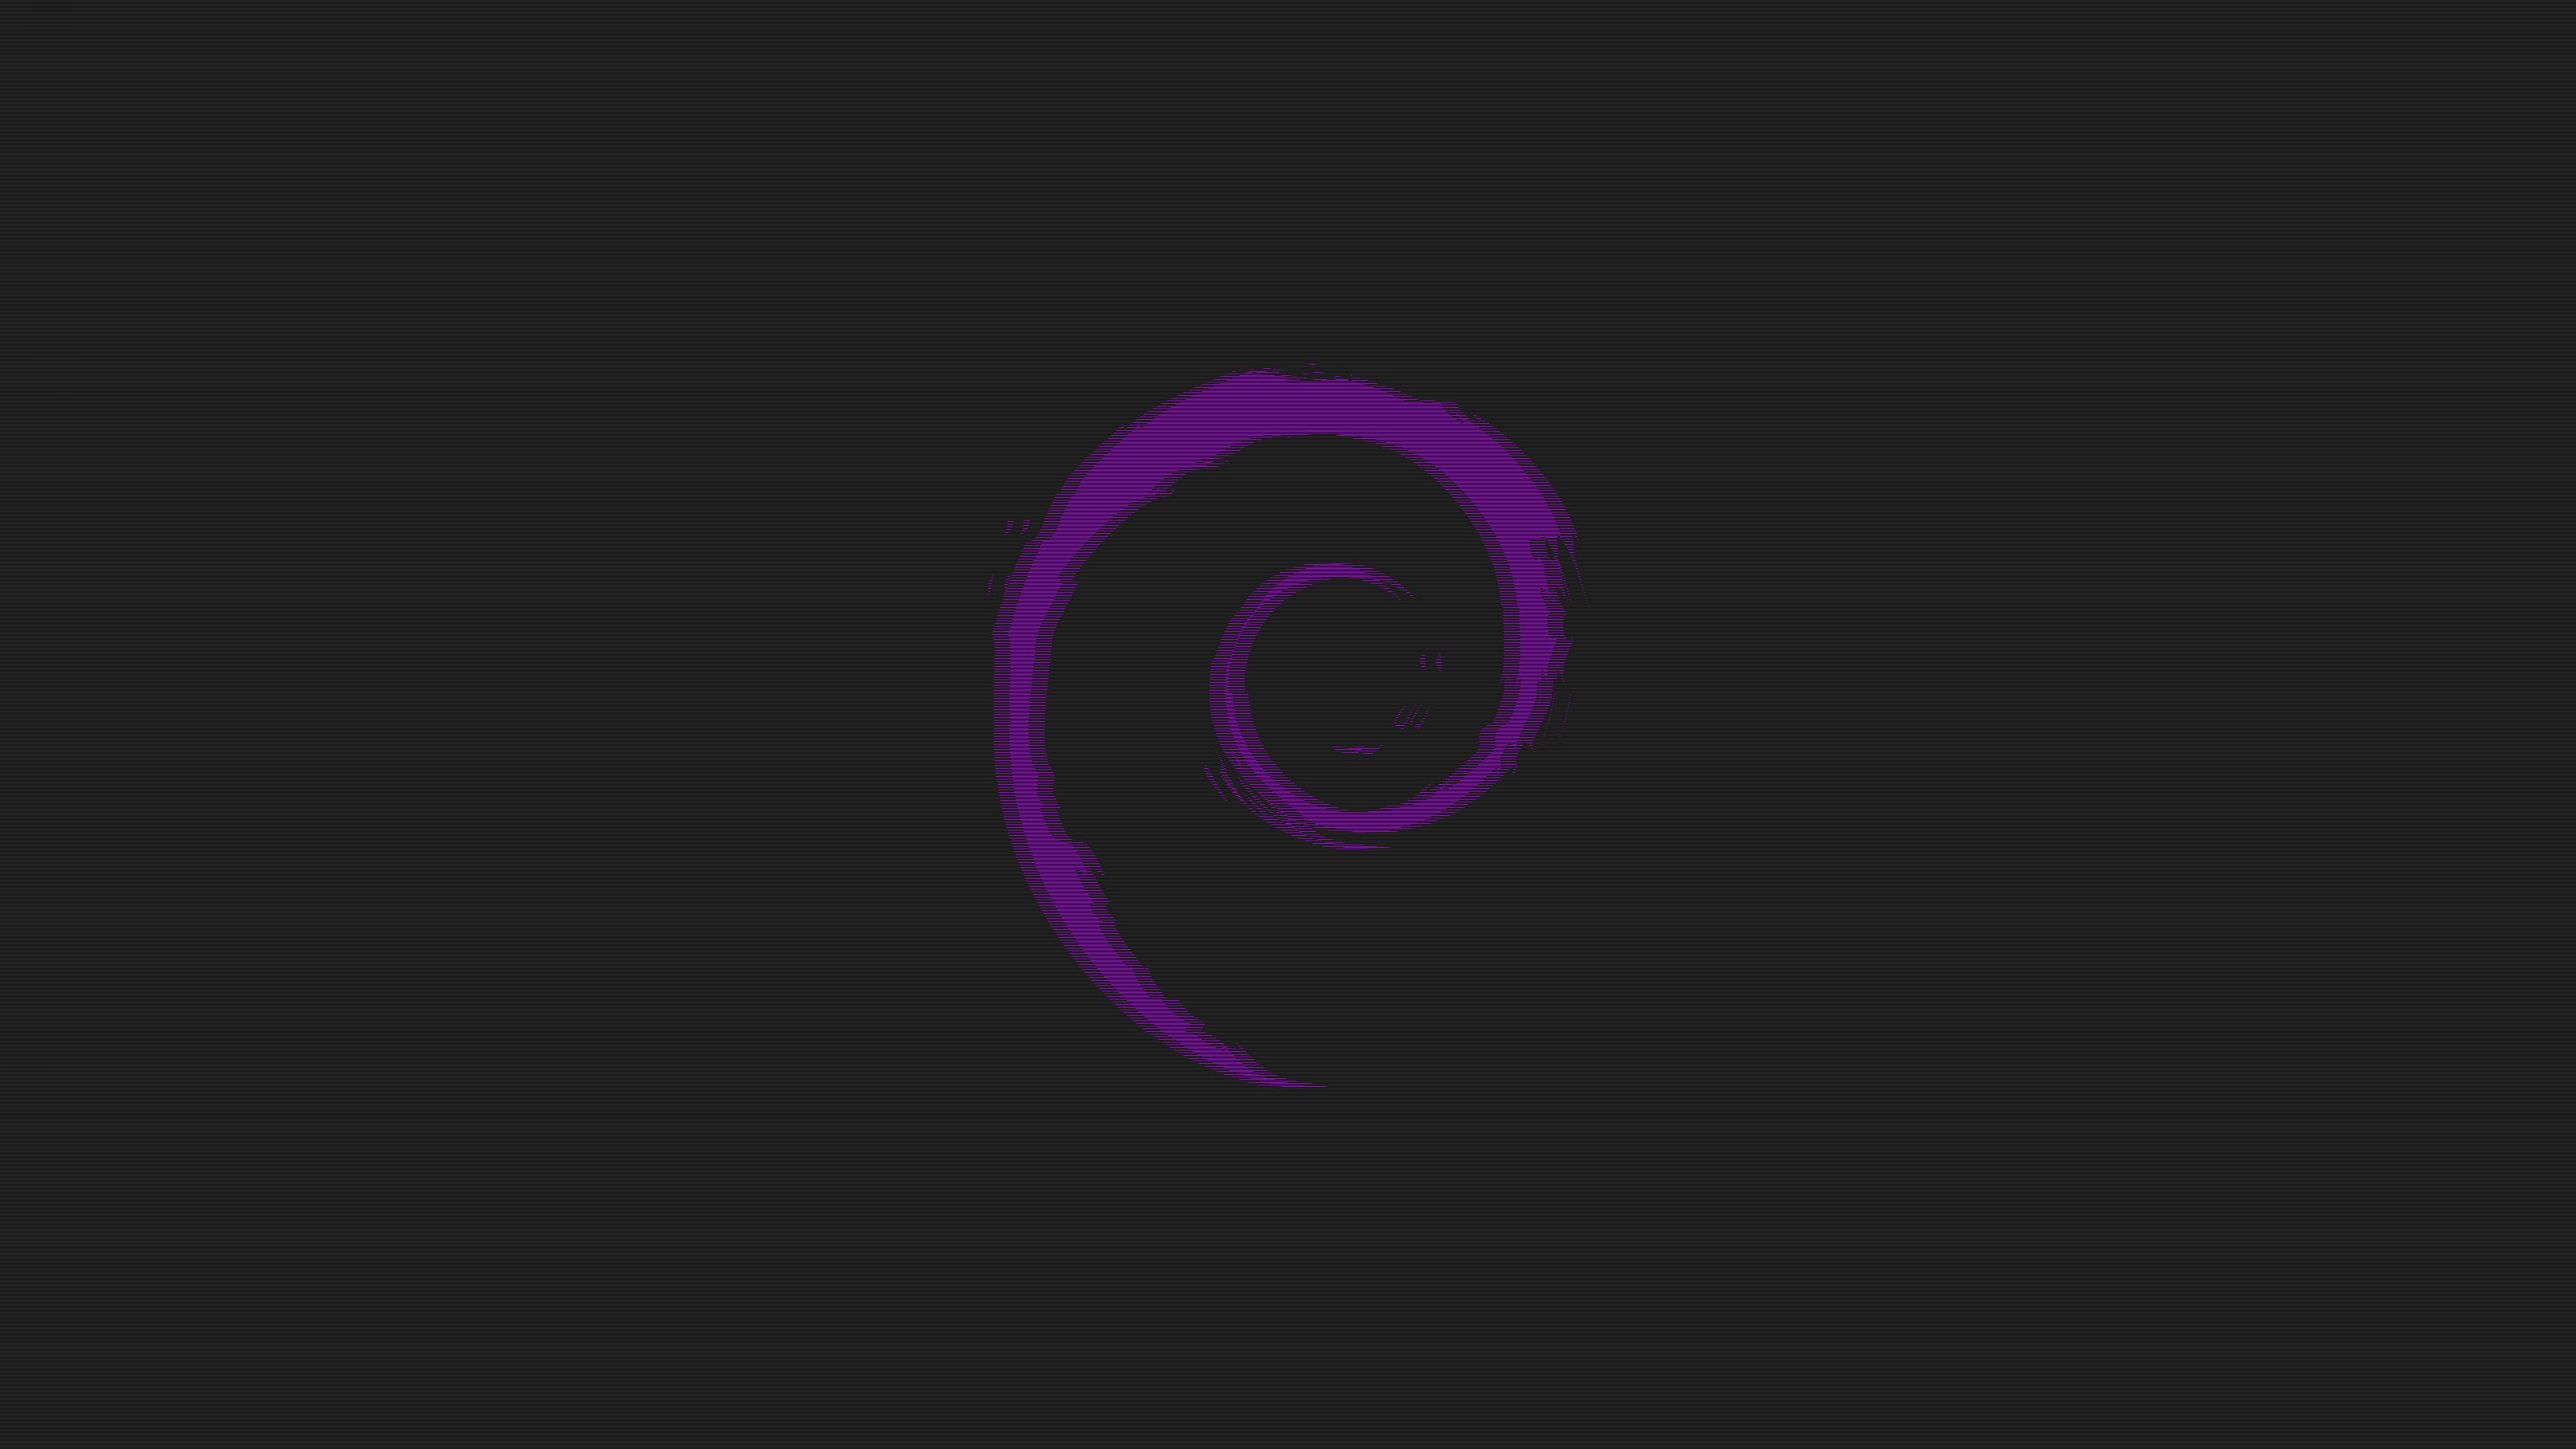 General 3840x2160 Debian minimalism simple background purple black background digital art